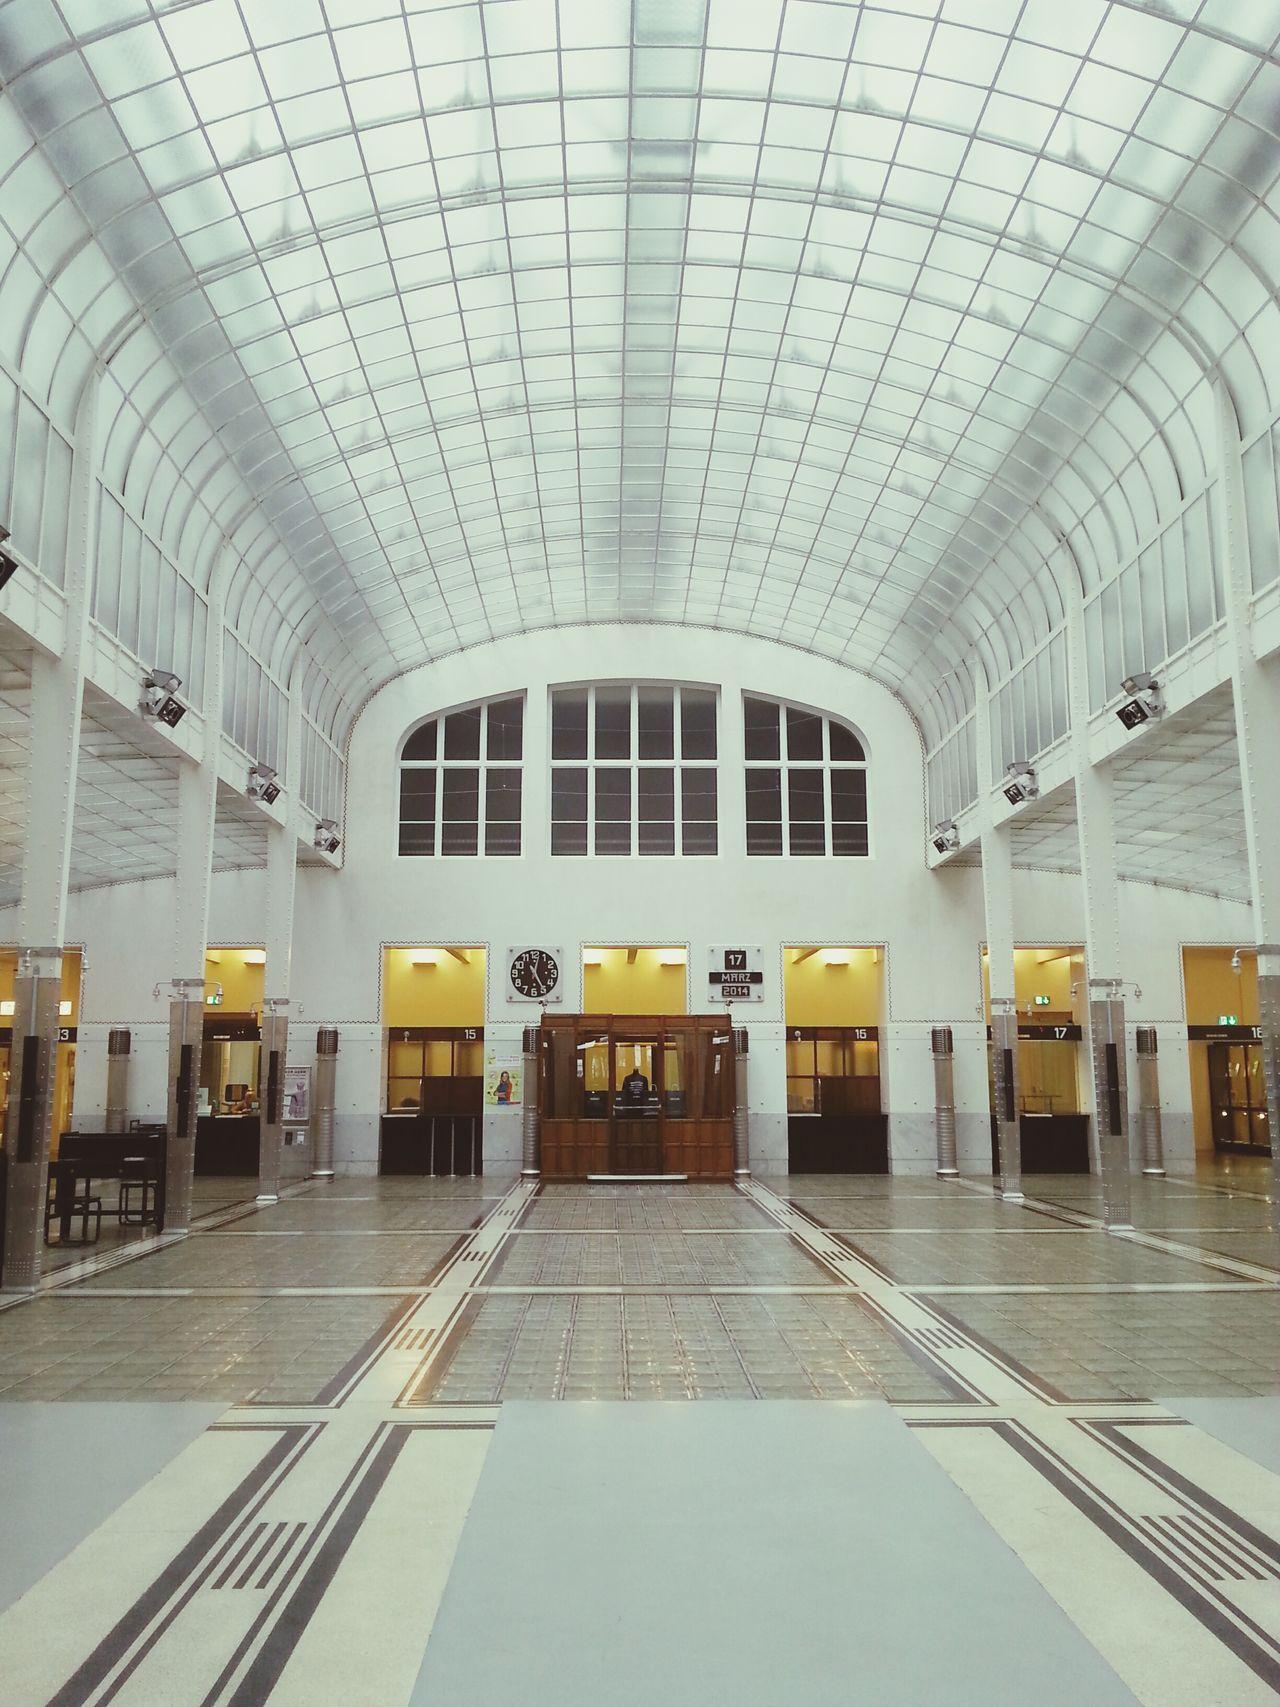 Beautiful stock photos of löwe, transportation, travel, indoors, railroad station